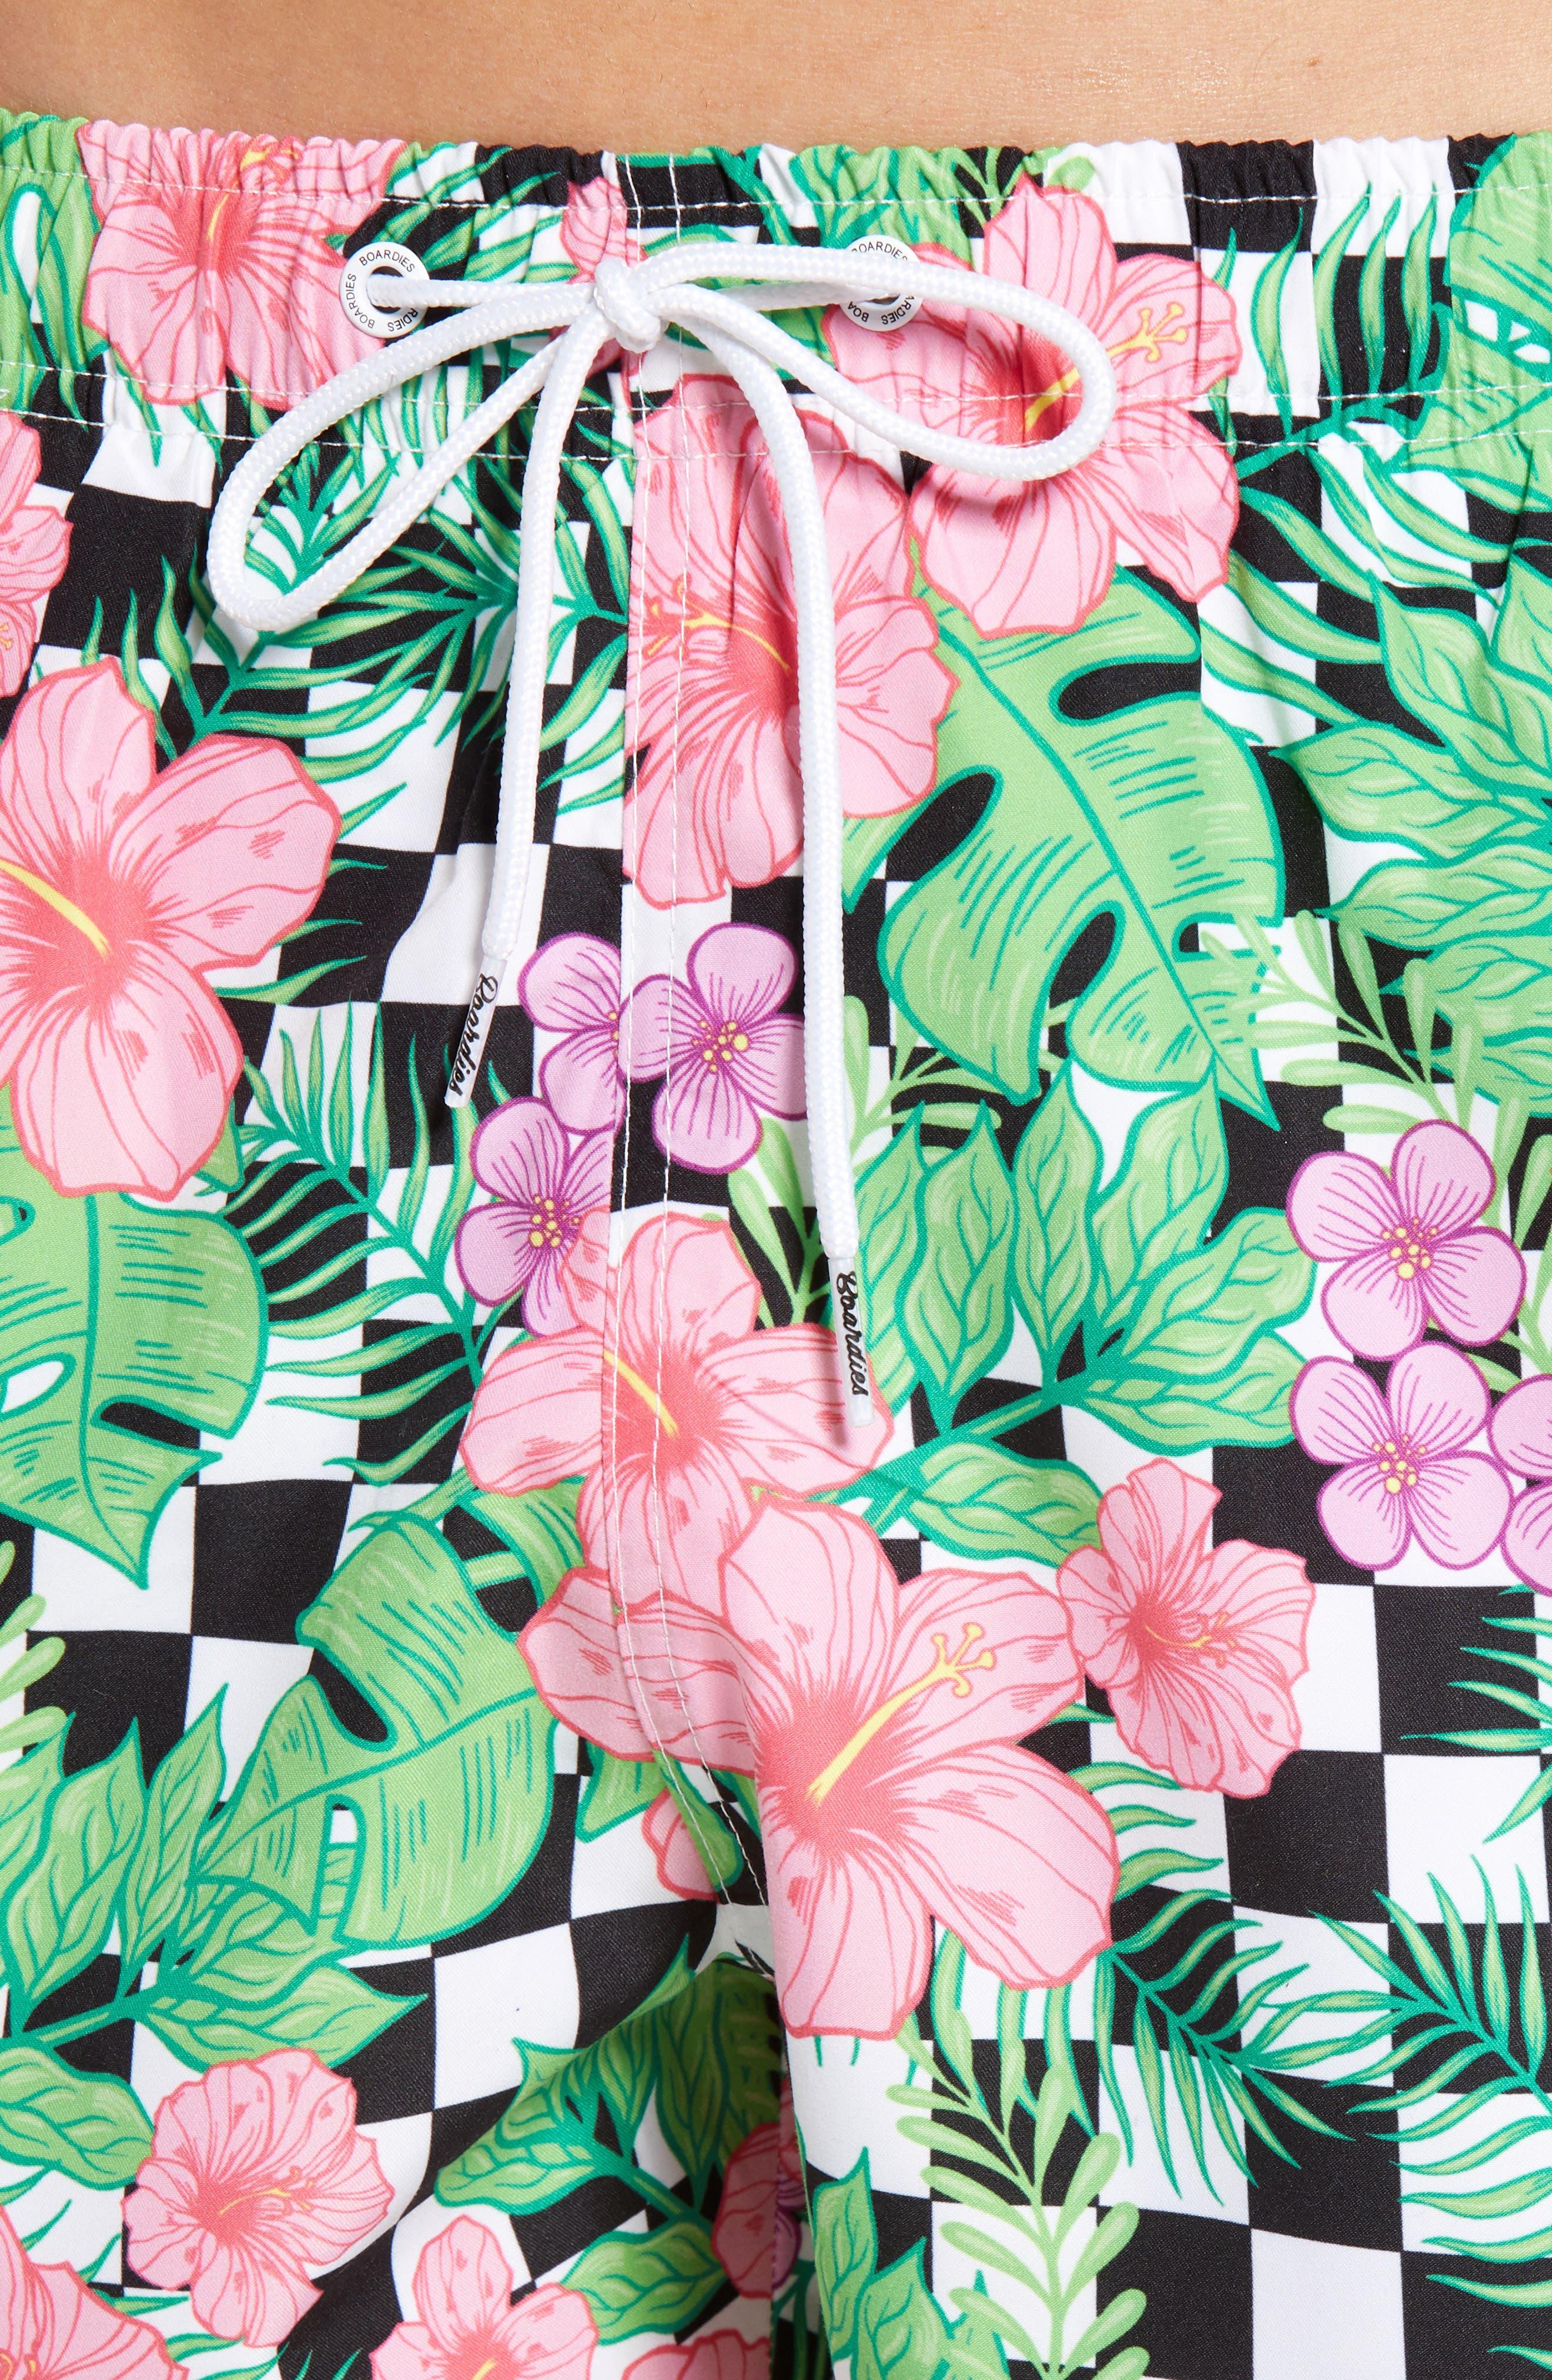 Checkerboard Floral Print Swim Trunks,                             Alternate thumbnail 4, color,                             MULTI